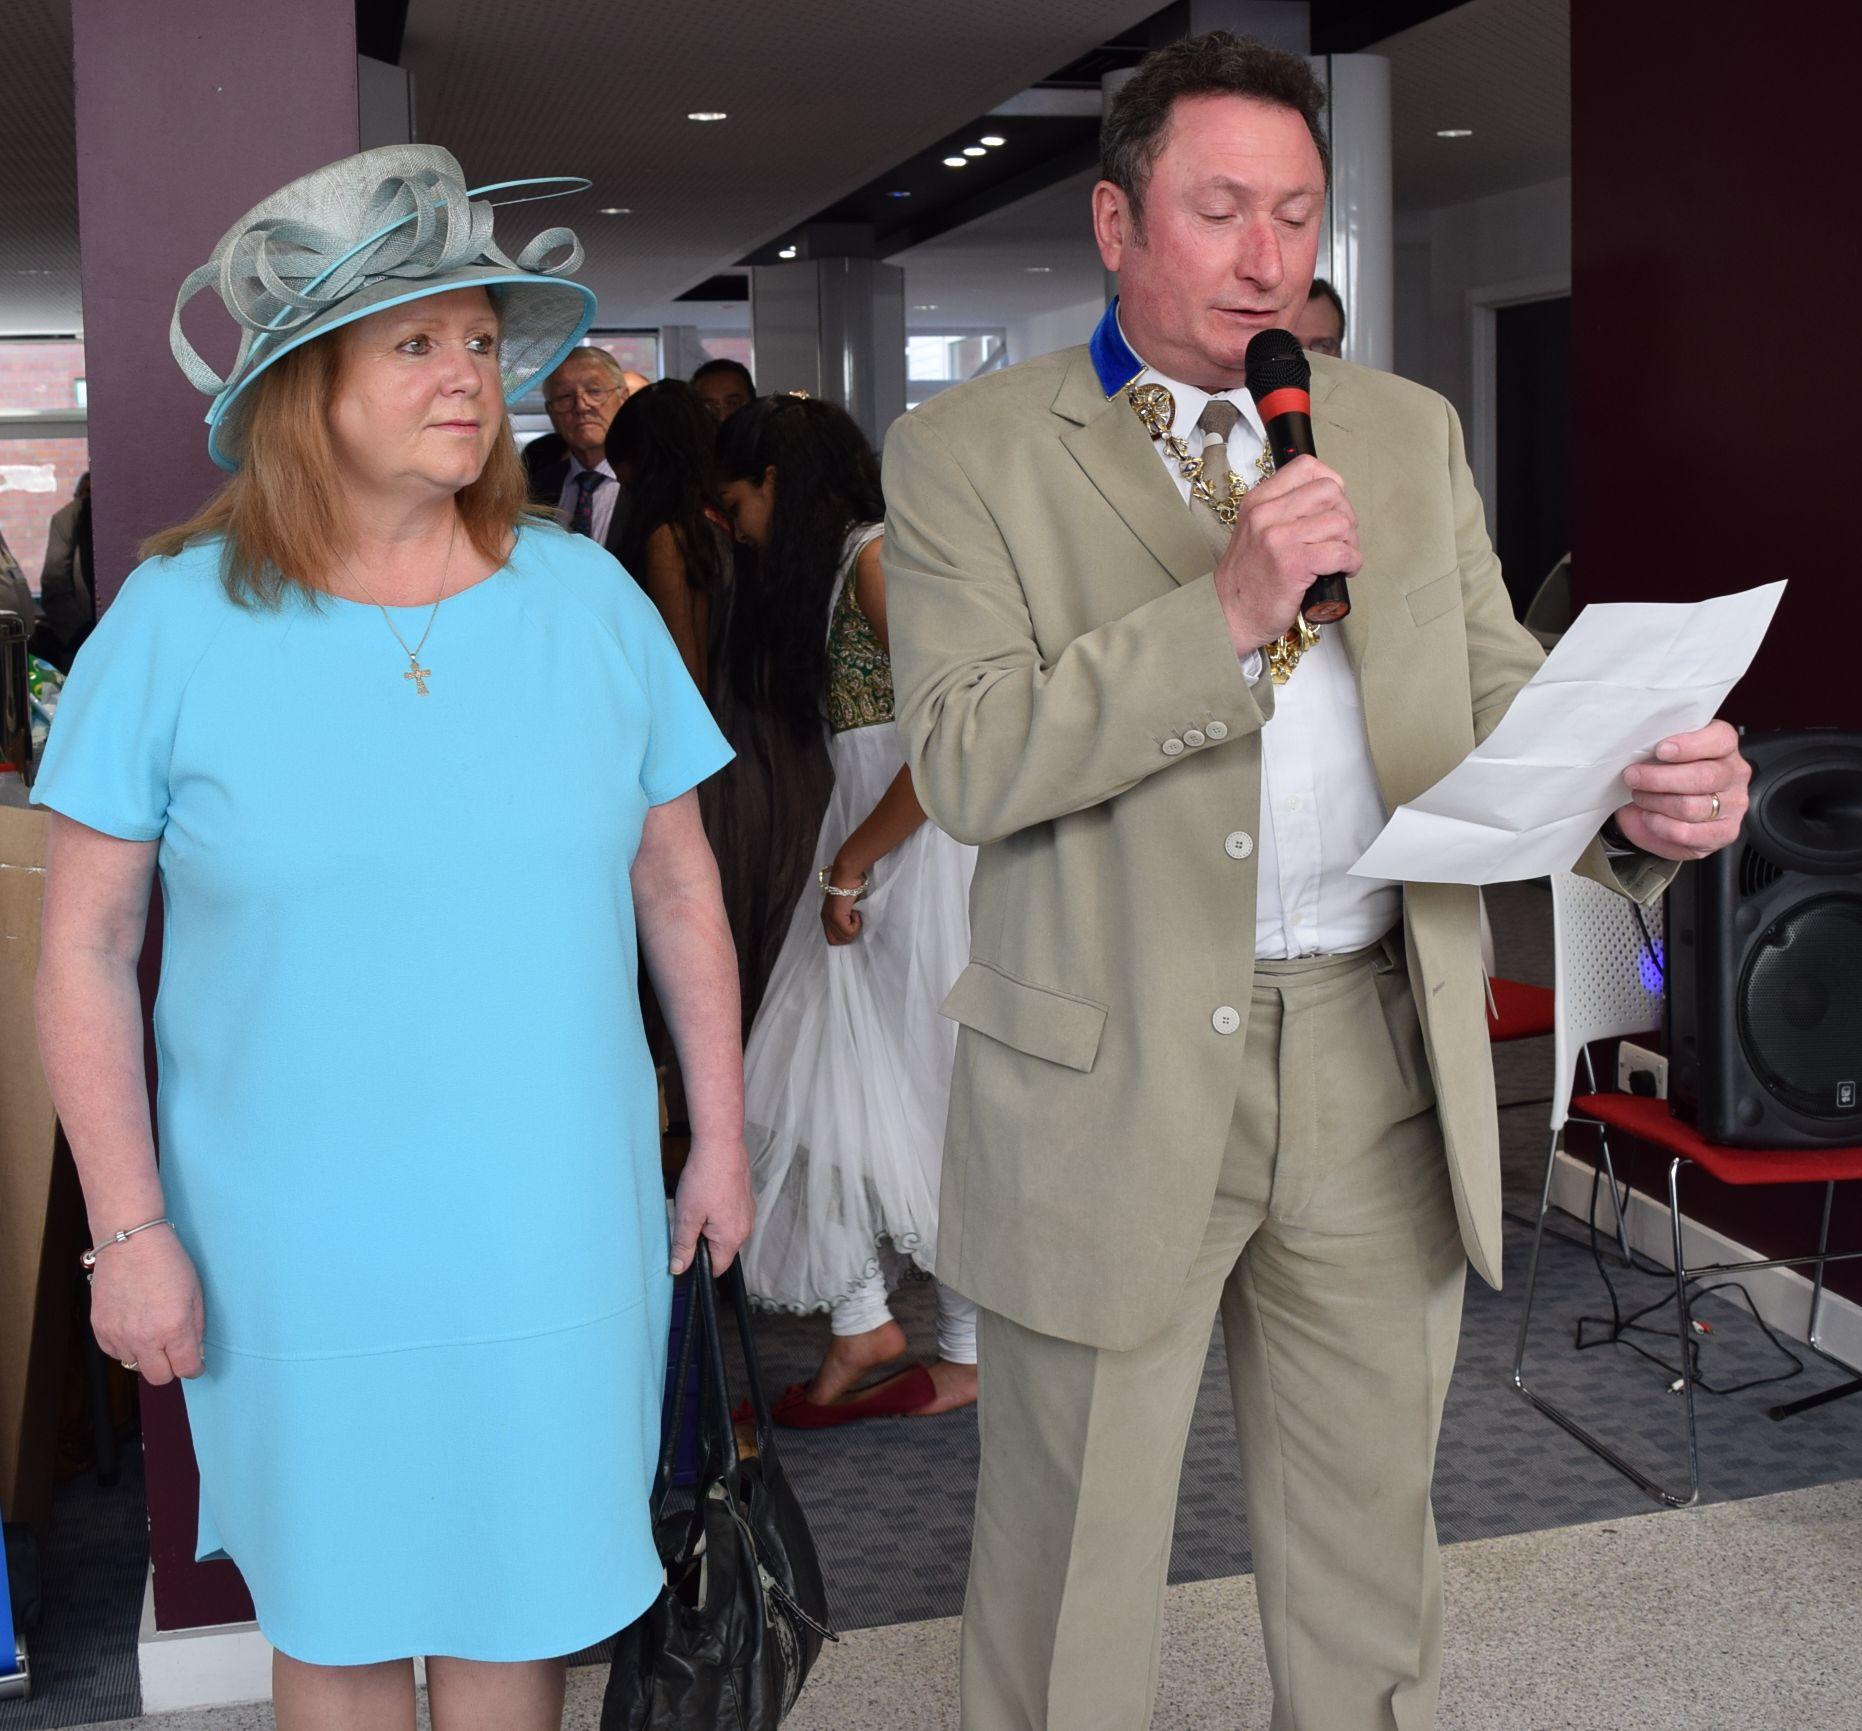 Mr Nick Pomfret, Mayor of Preston opens the Health Mela